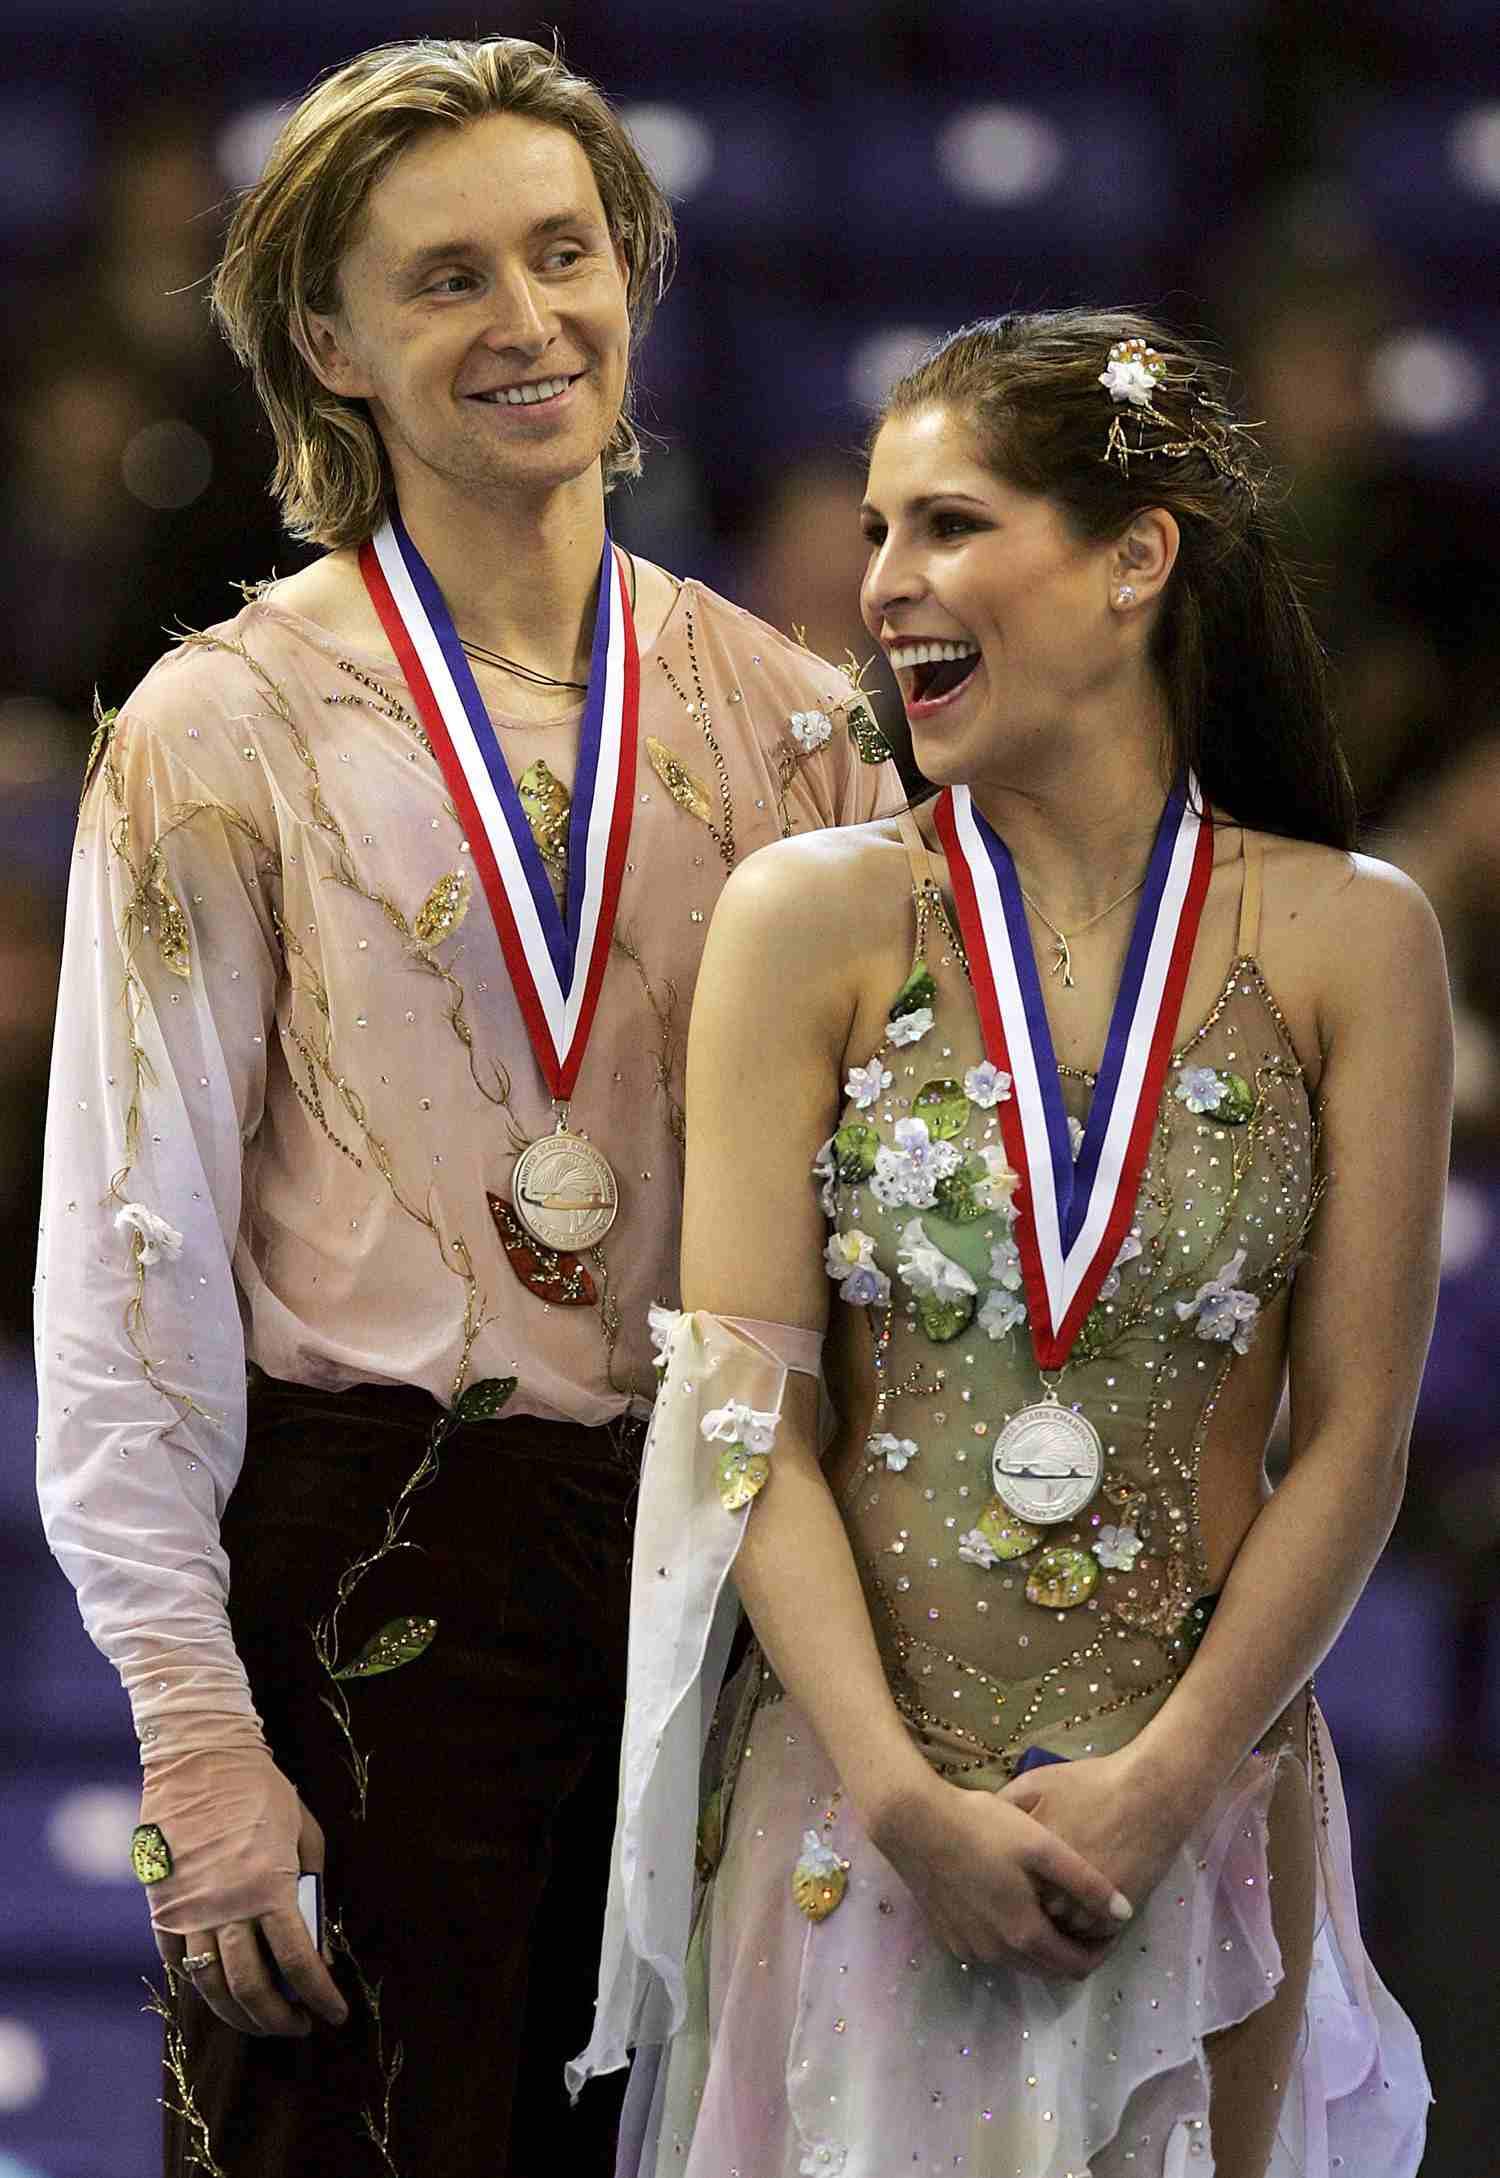 2007 State Farm U.S. Figure Skating Championships